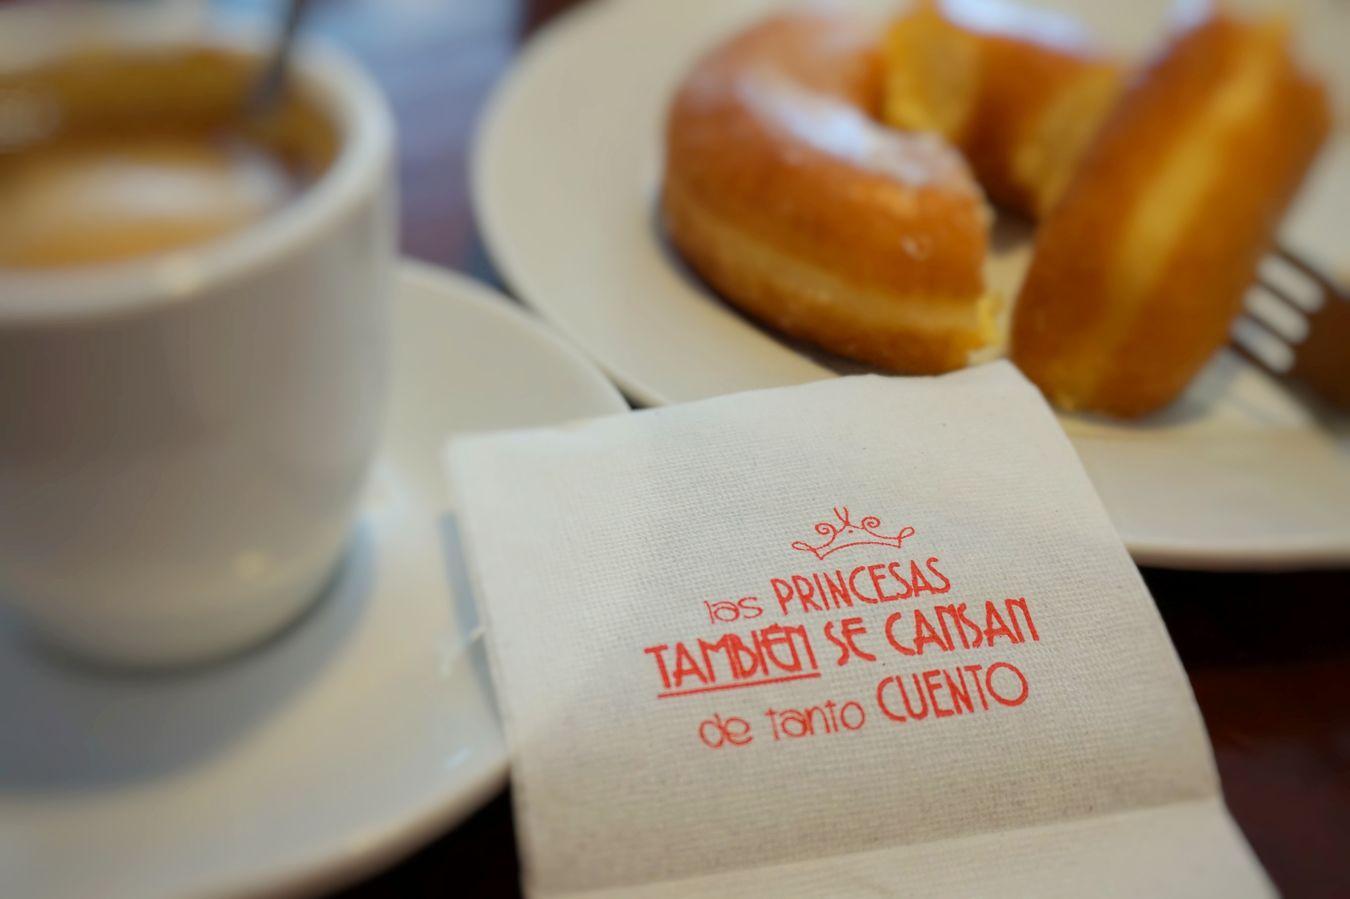 Spanish's breakfast with funny message Breakfast Donuts Message Napkin Serviette Short Story Spanish Food Spanish Phrase Story